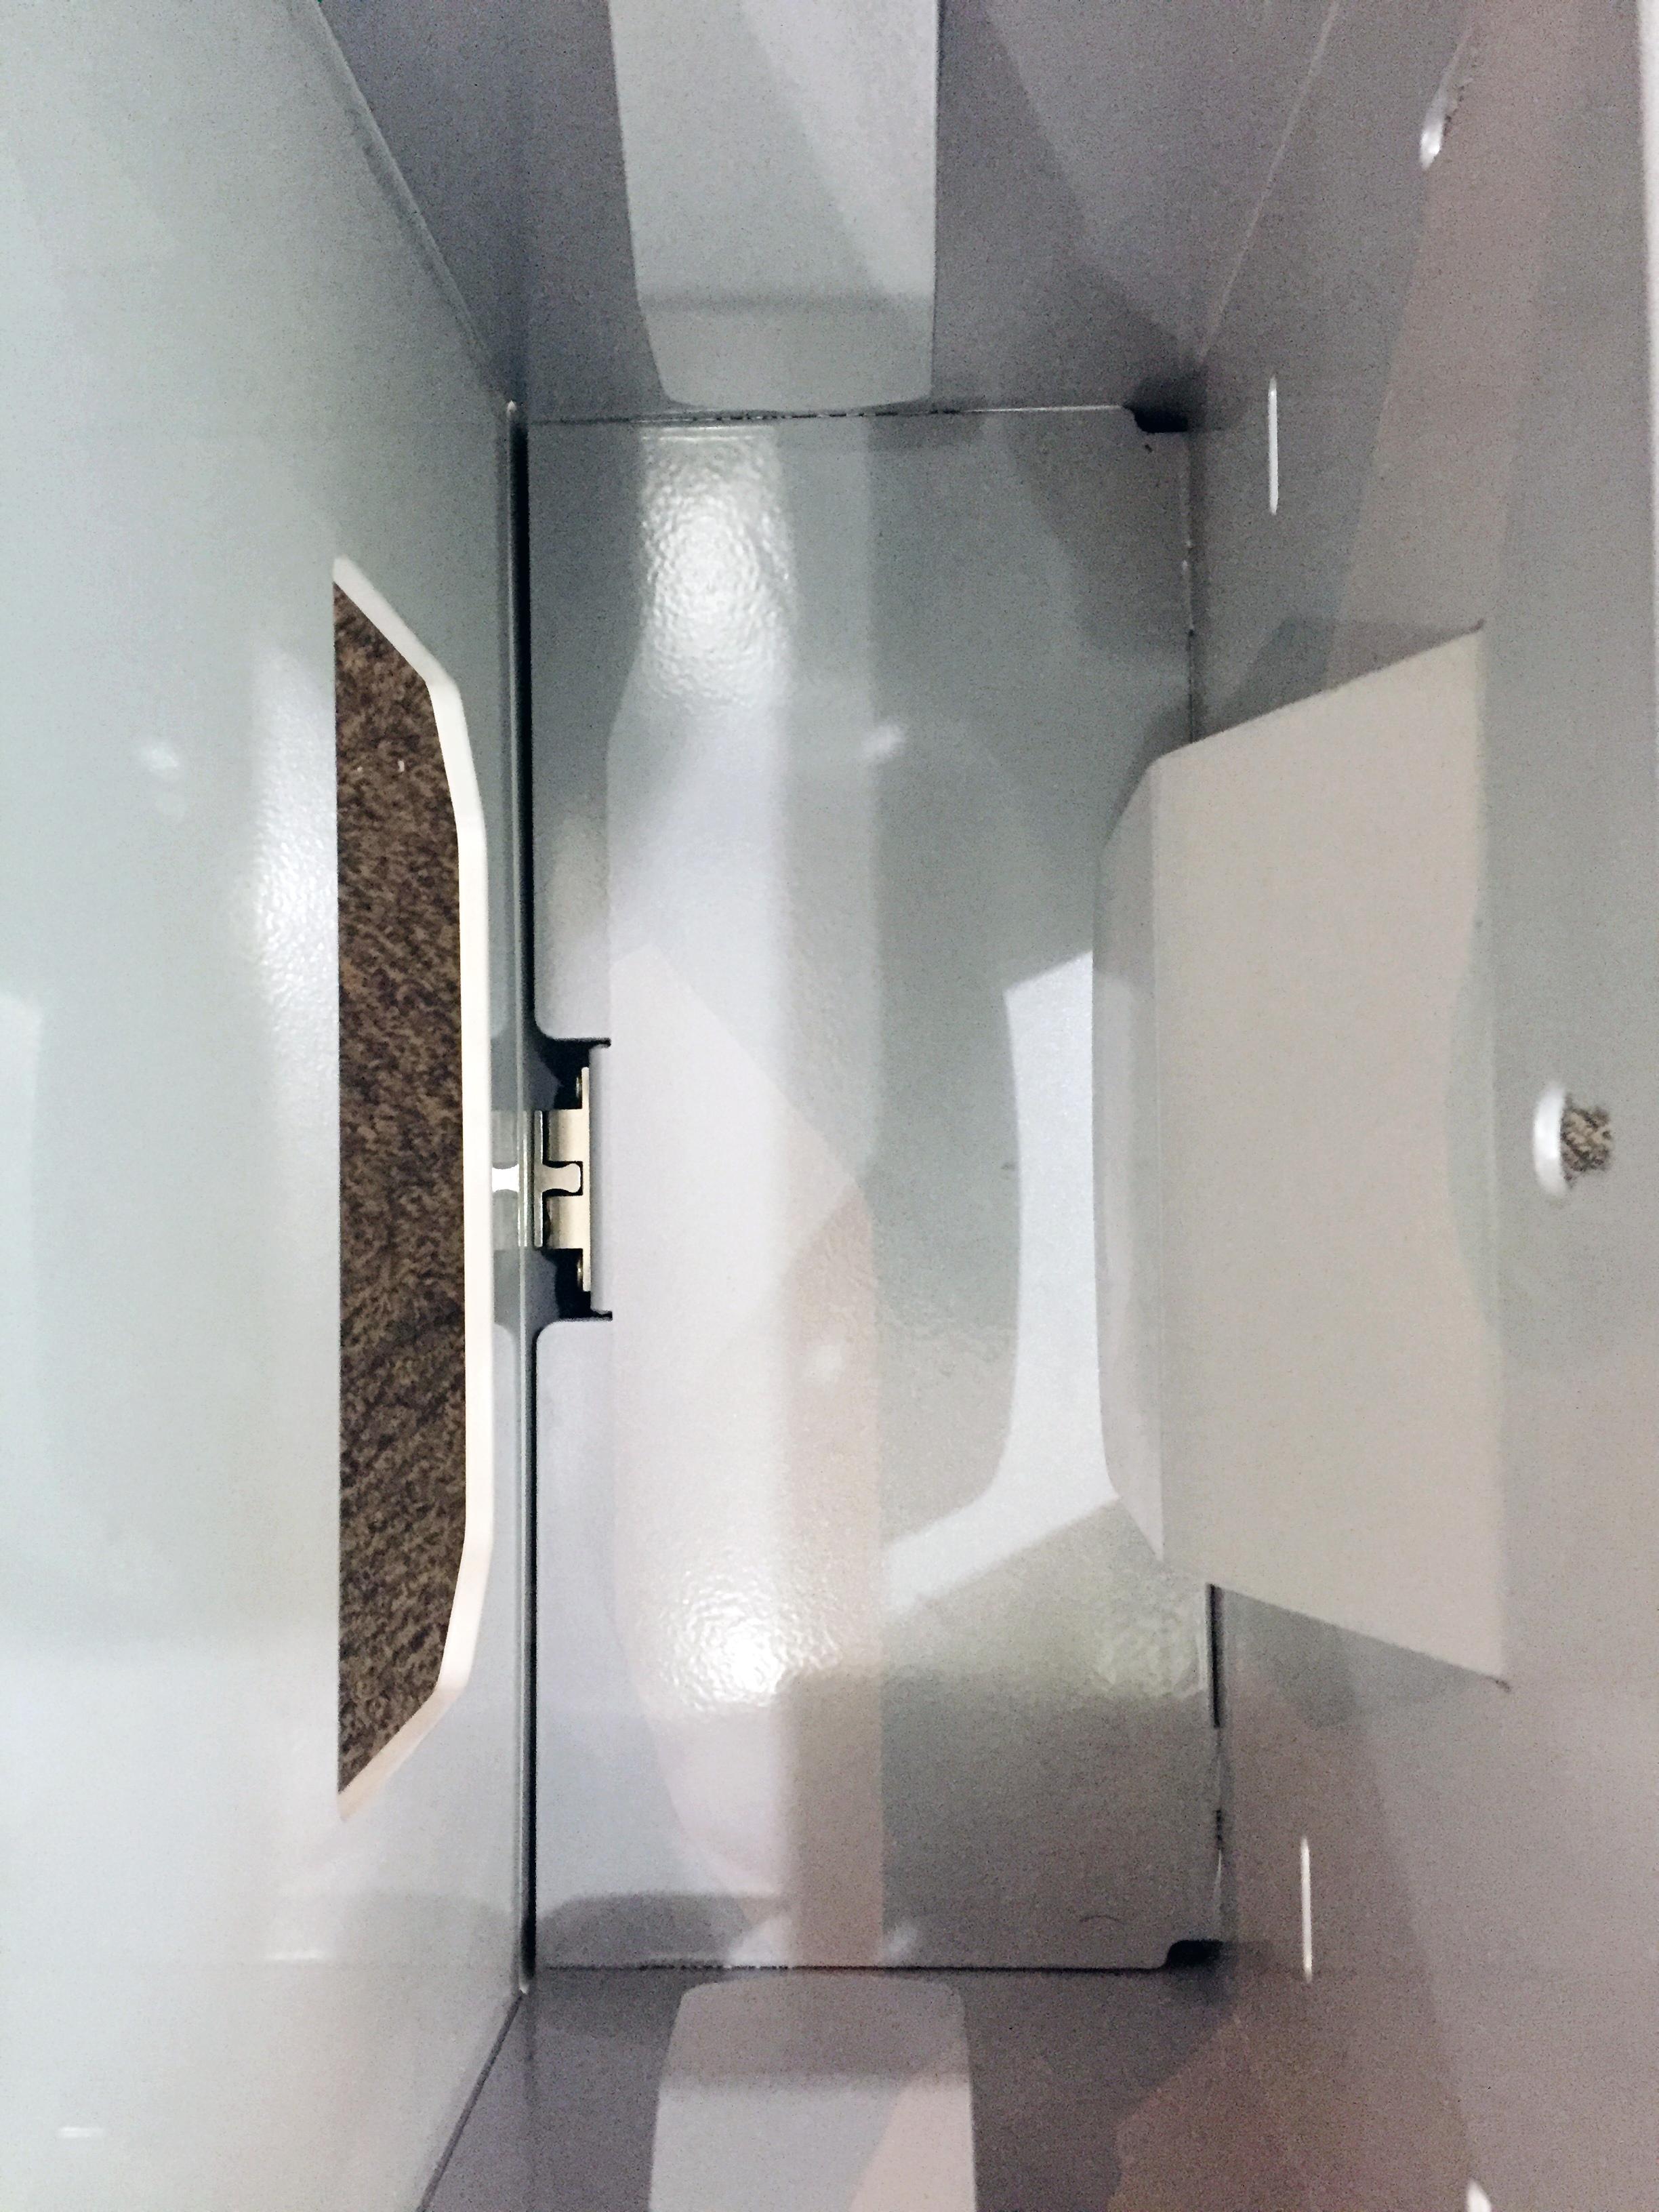 Wall Dispenser WD-16